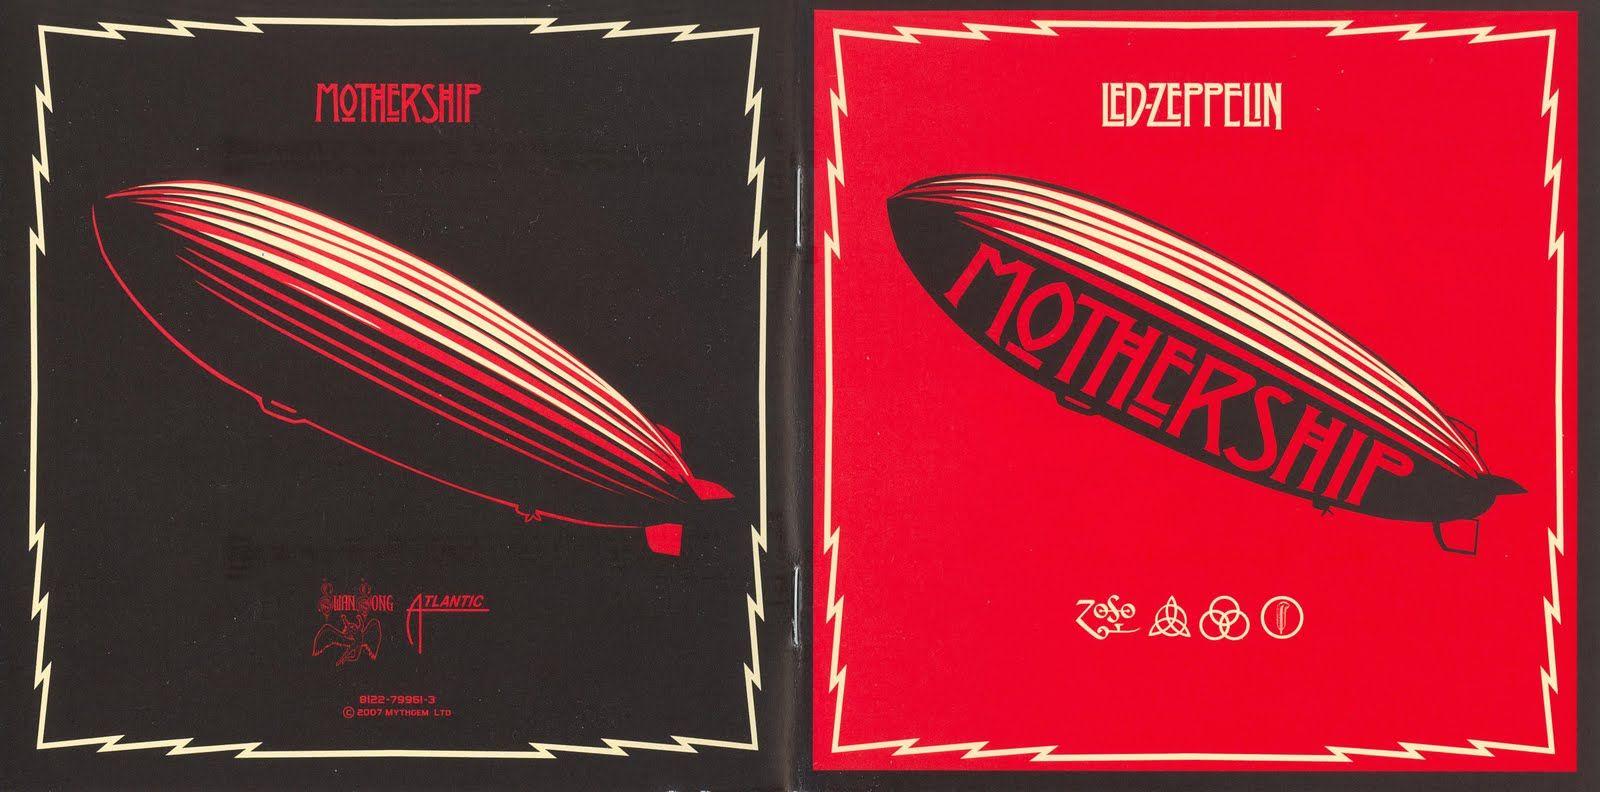 Led Zeppelin Wallpaper Widescreen 969 550 Led Zepplin Wallpapers 40 Wallpapers Adorable Wallpapers Led Zeppelin Wallpaper Led Zepplin Led Zeppelin